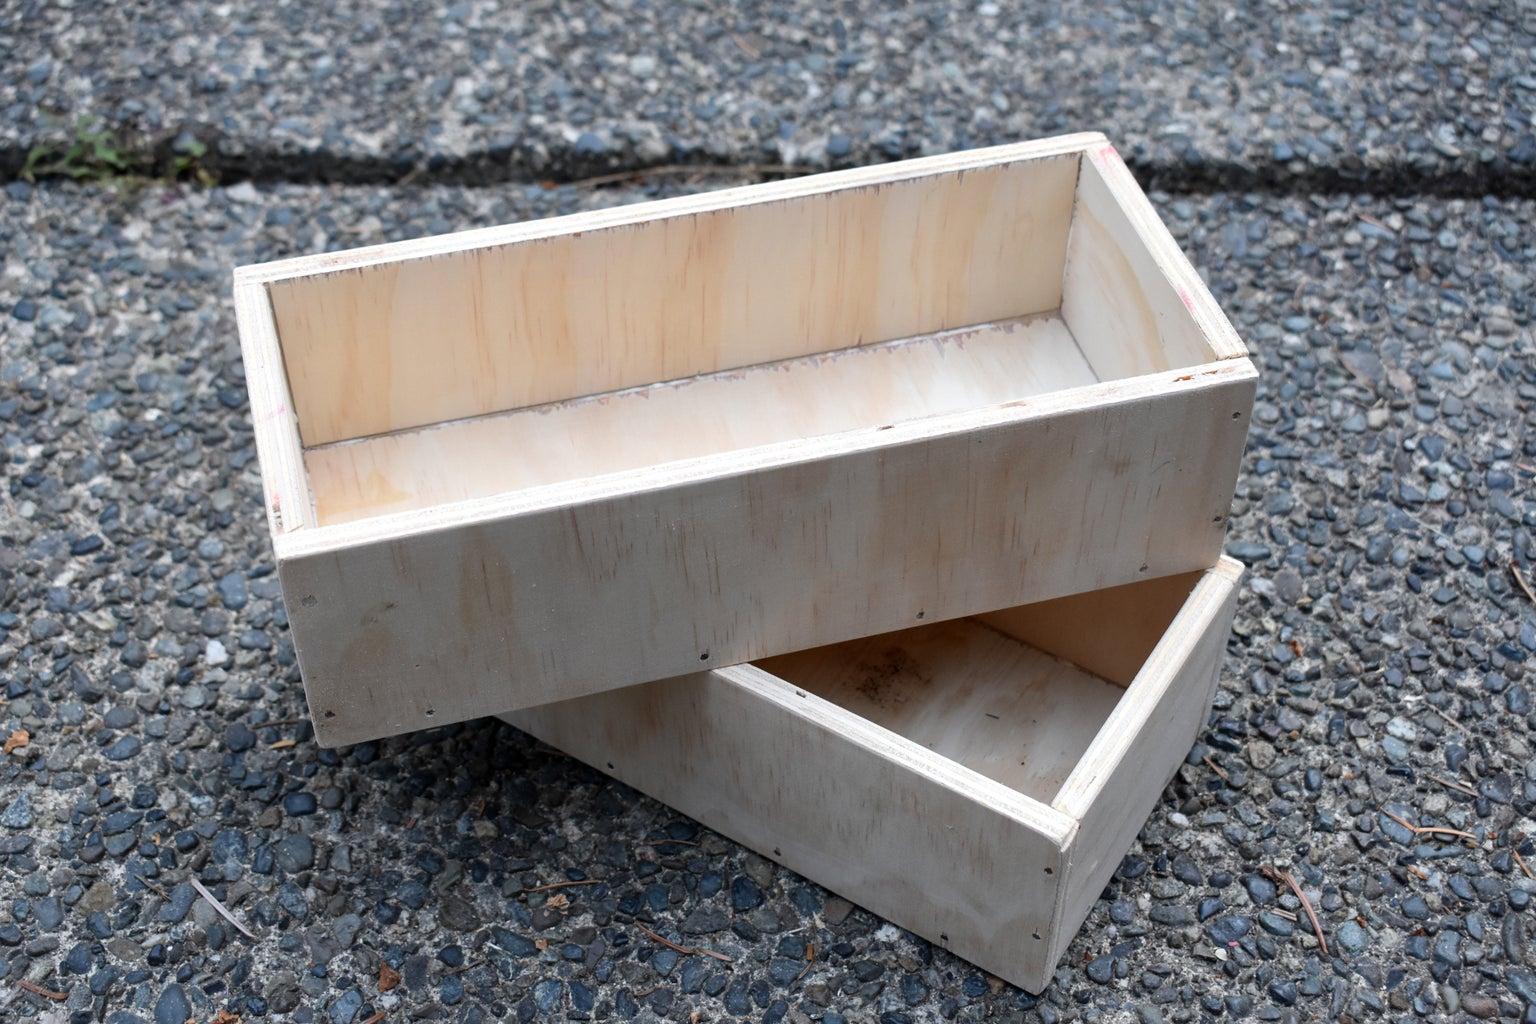 Box Planter Construction